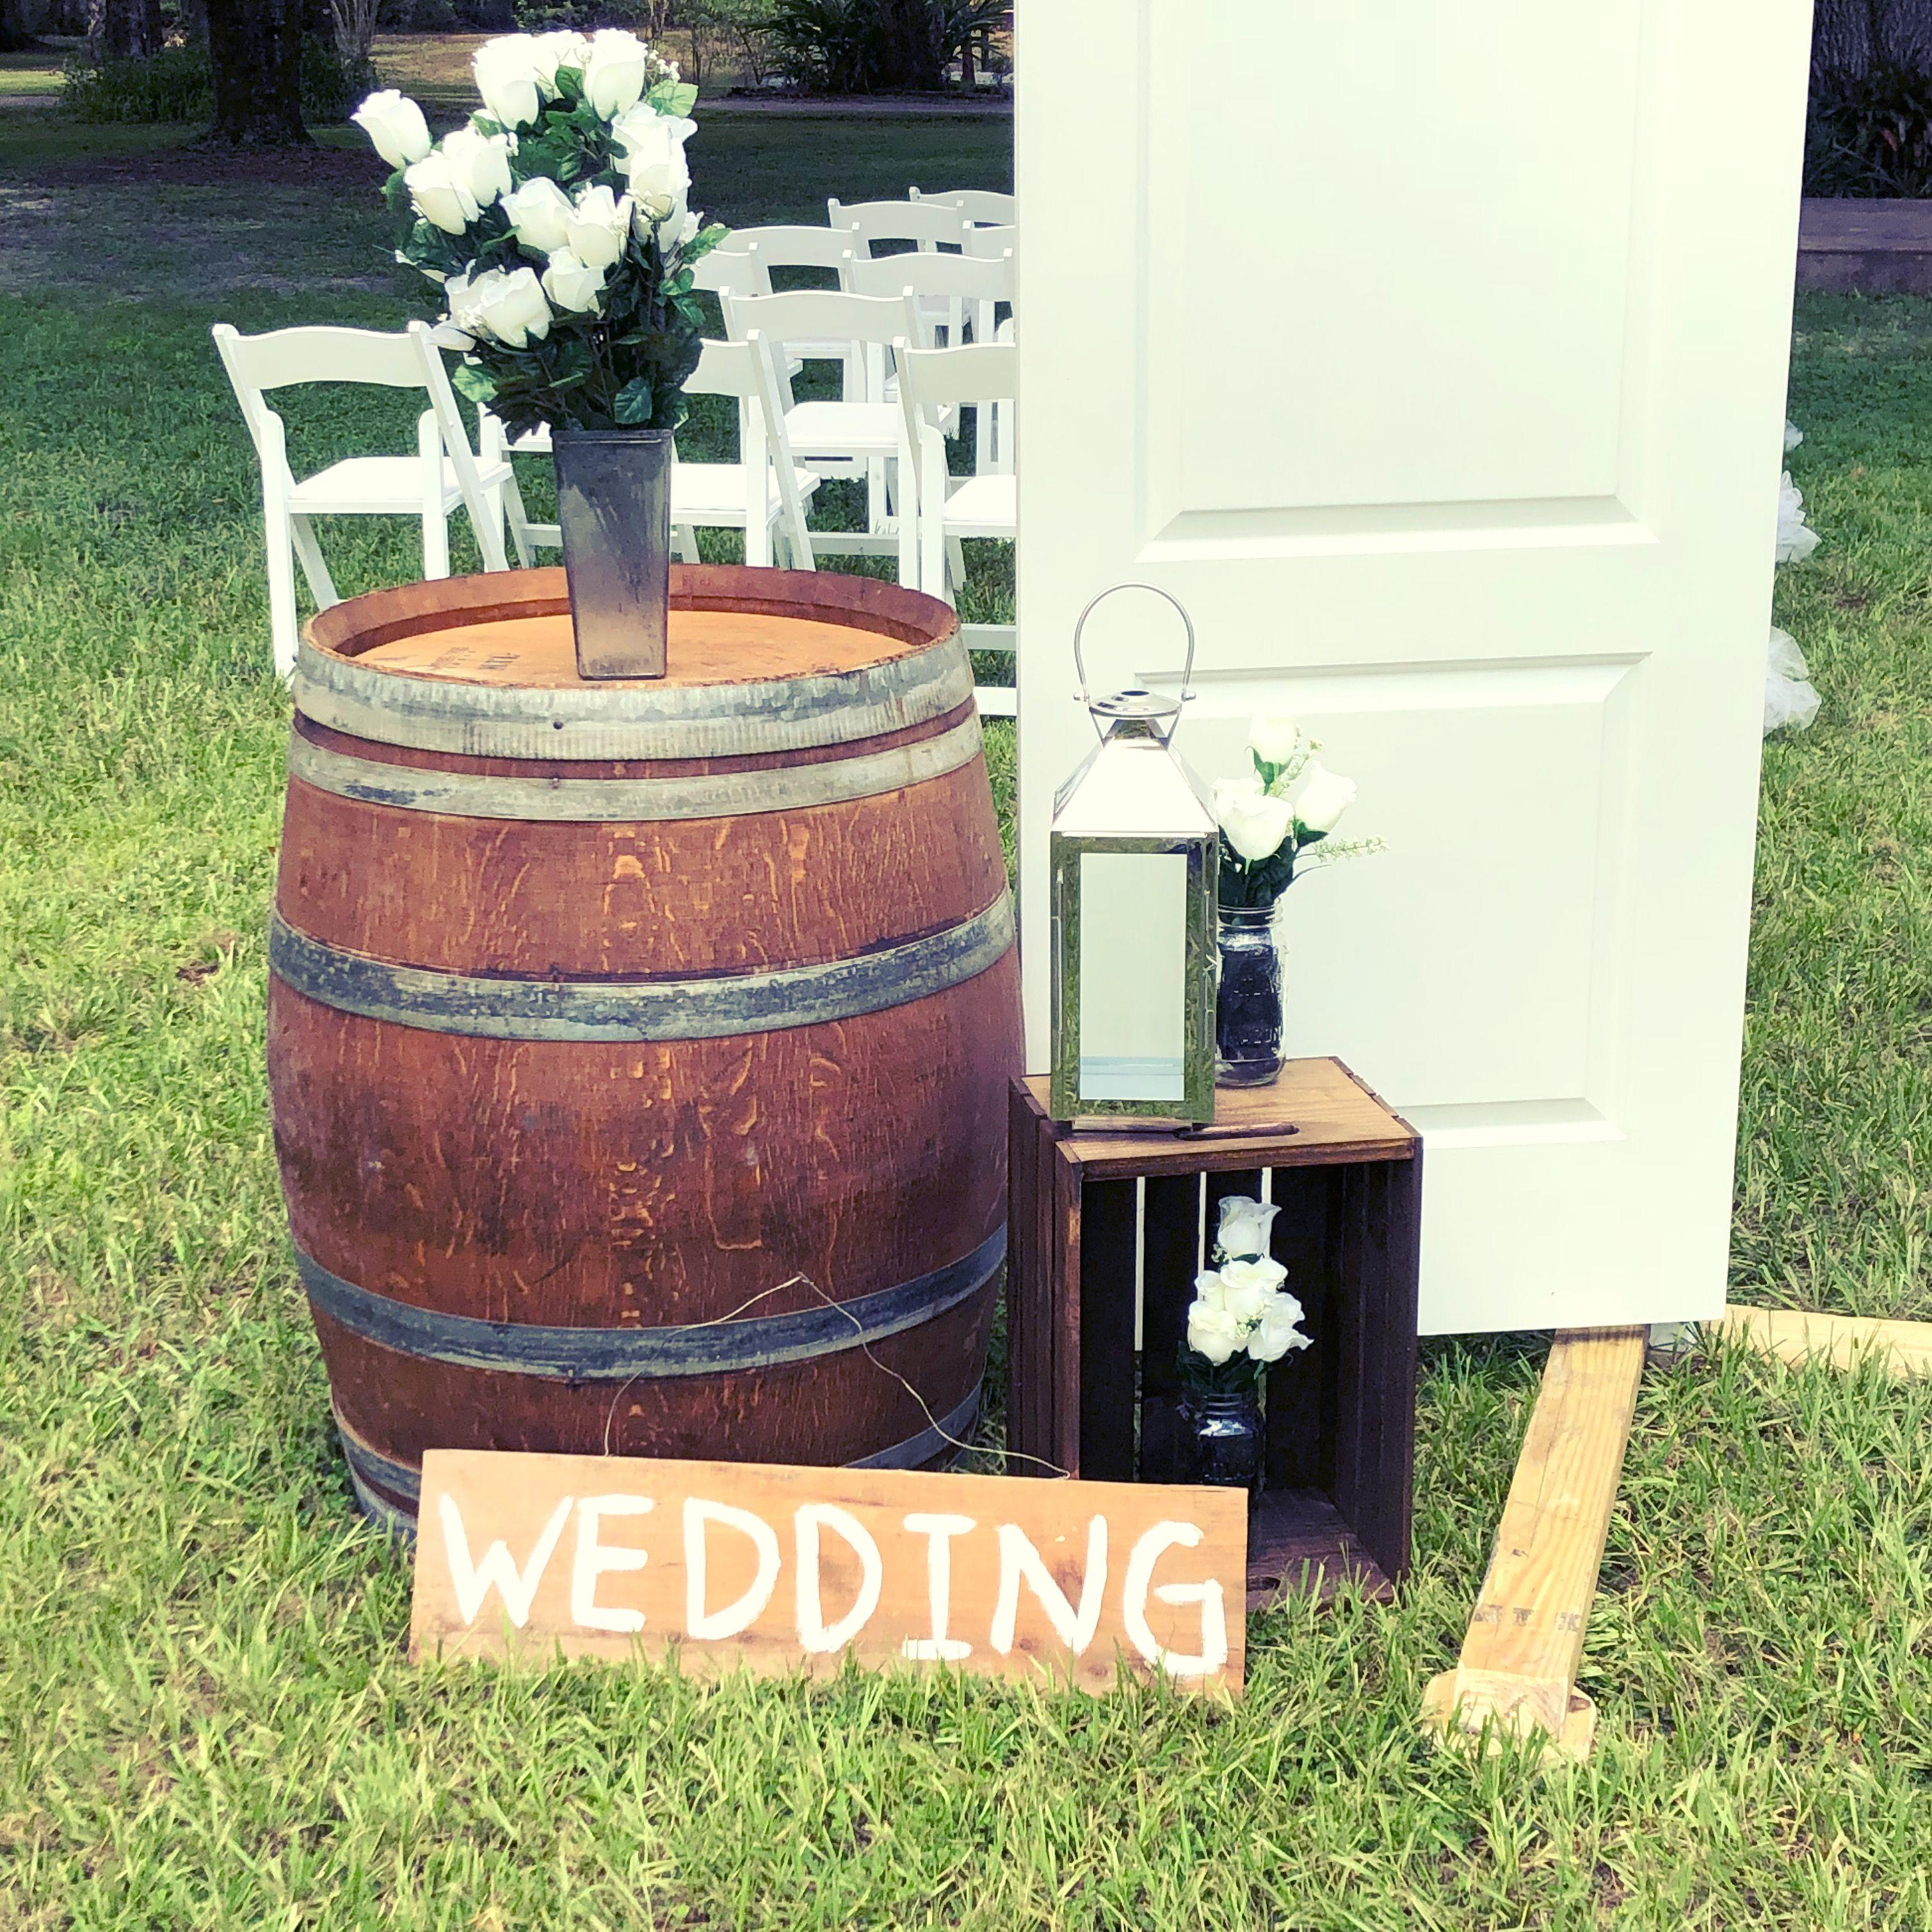 Outdoor Wedding Ceremony Doors: Rustic Chic Wedding Ceremony Decorations And Design